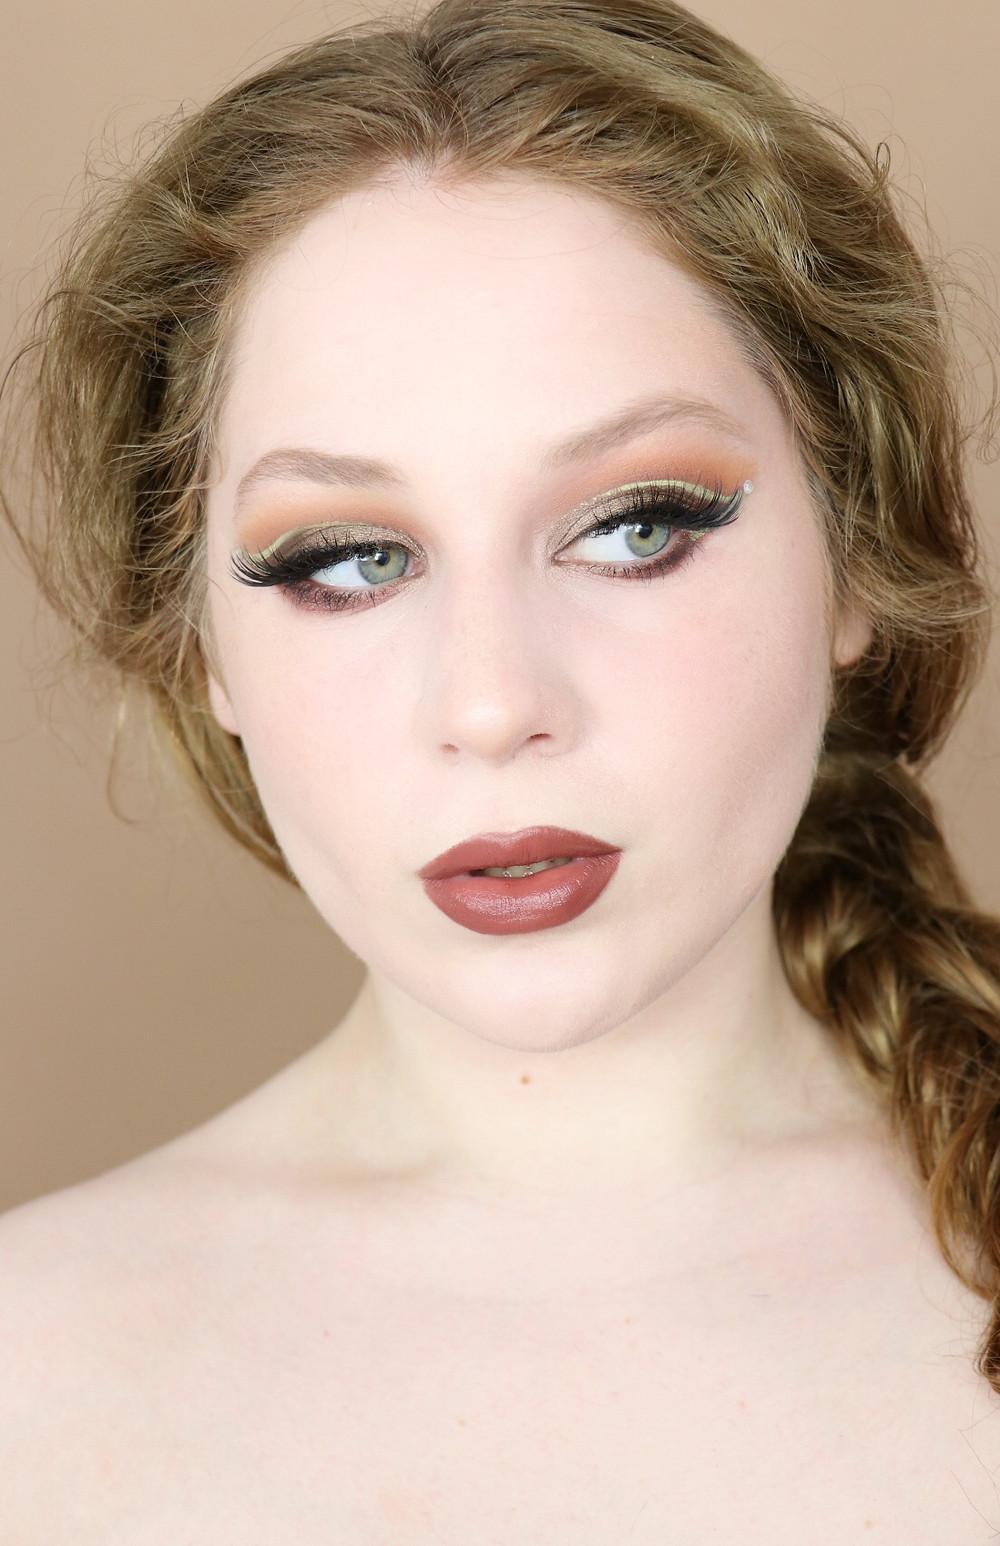 GRWM Wander Beauty Rush OLIVE GREEN Creative Fall GLAM Makeup Tutorial 2020 | Lillee Jean